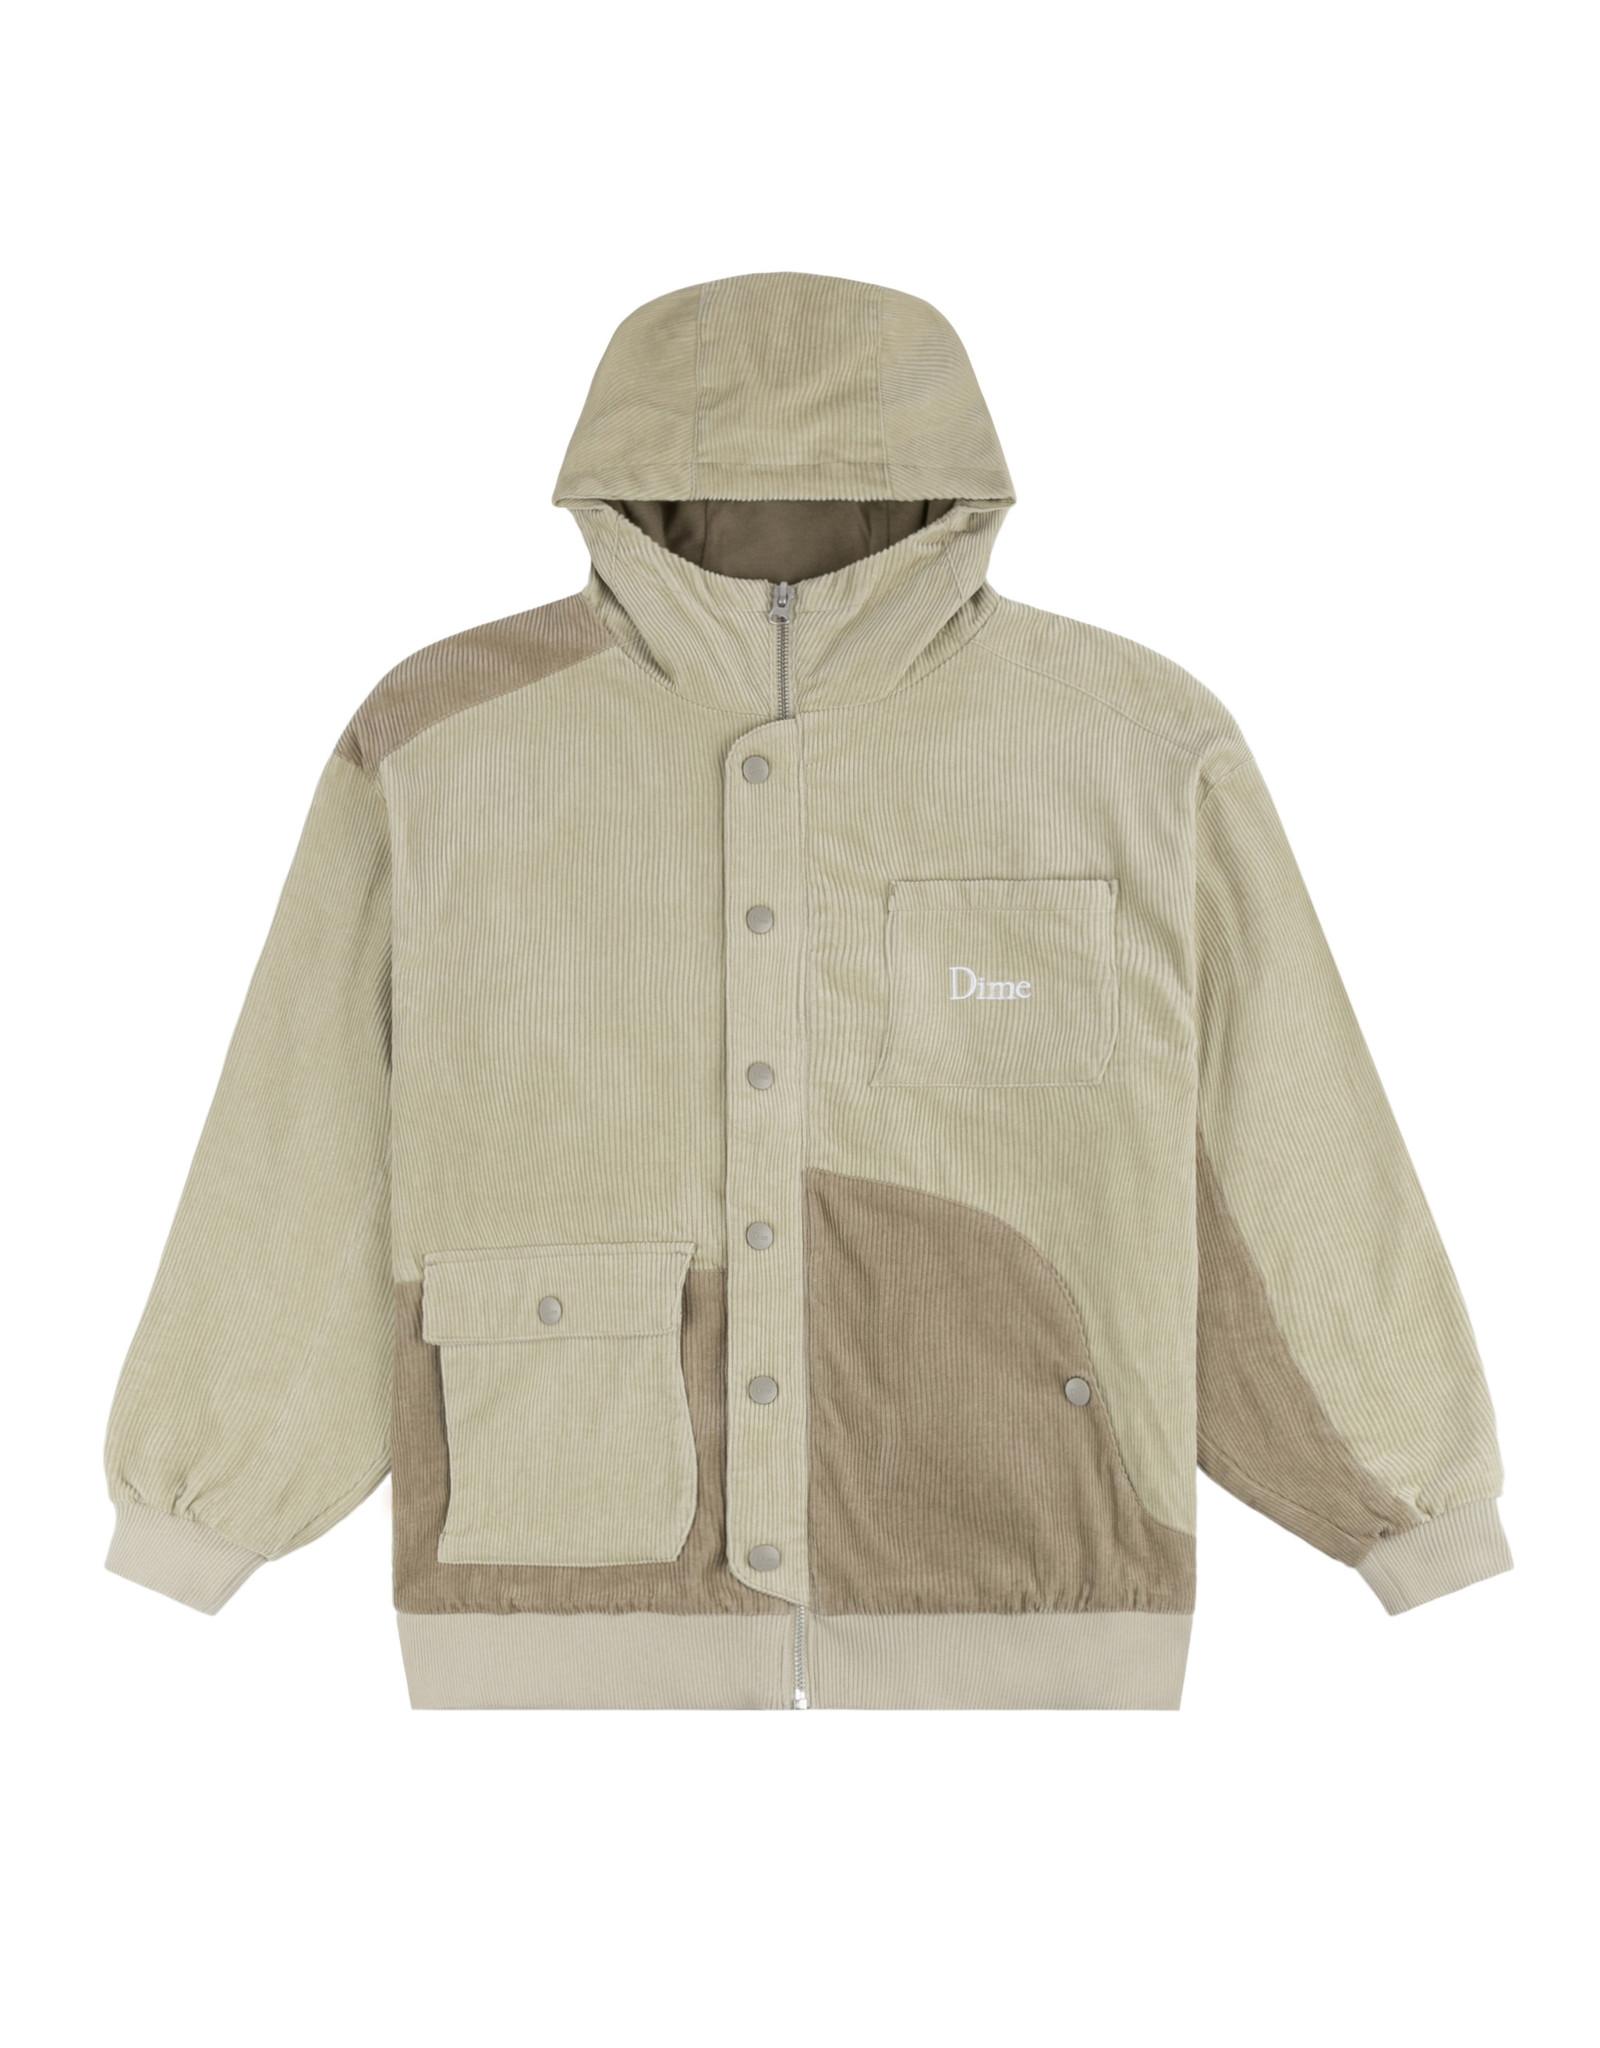 DIME cordura hooded jacket